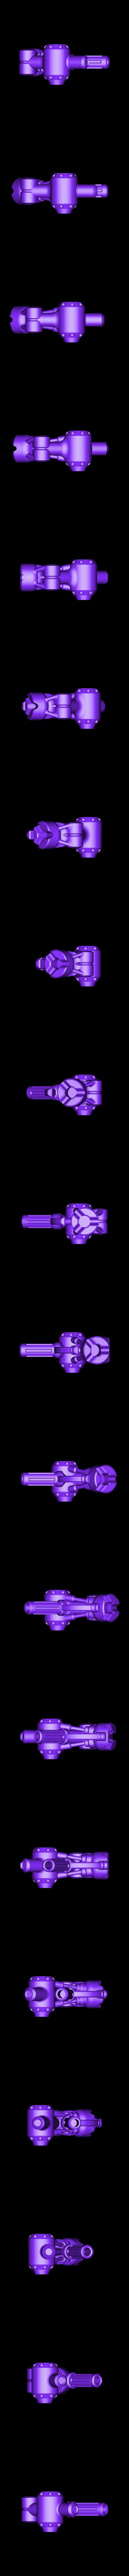 L-leg-leg.stl Download free STL file Pod Walker • 3D printing object, ferjerez3d